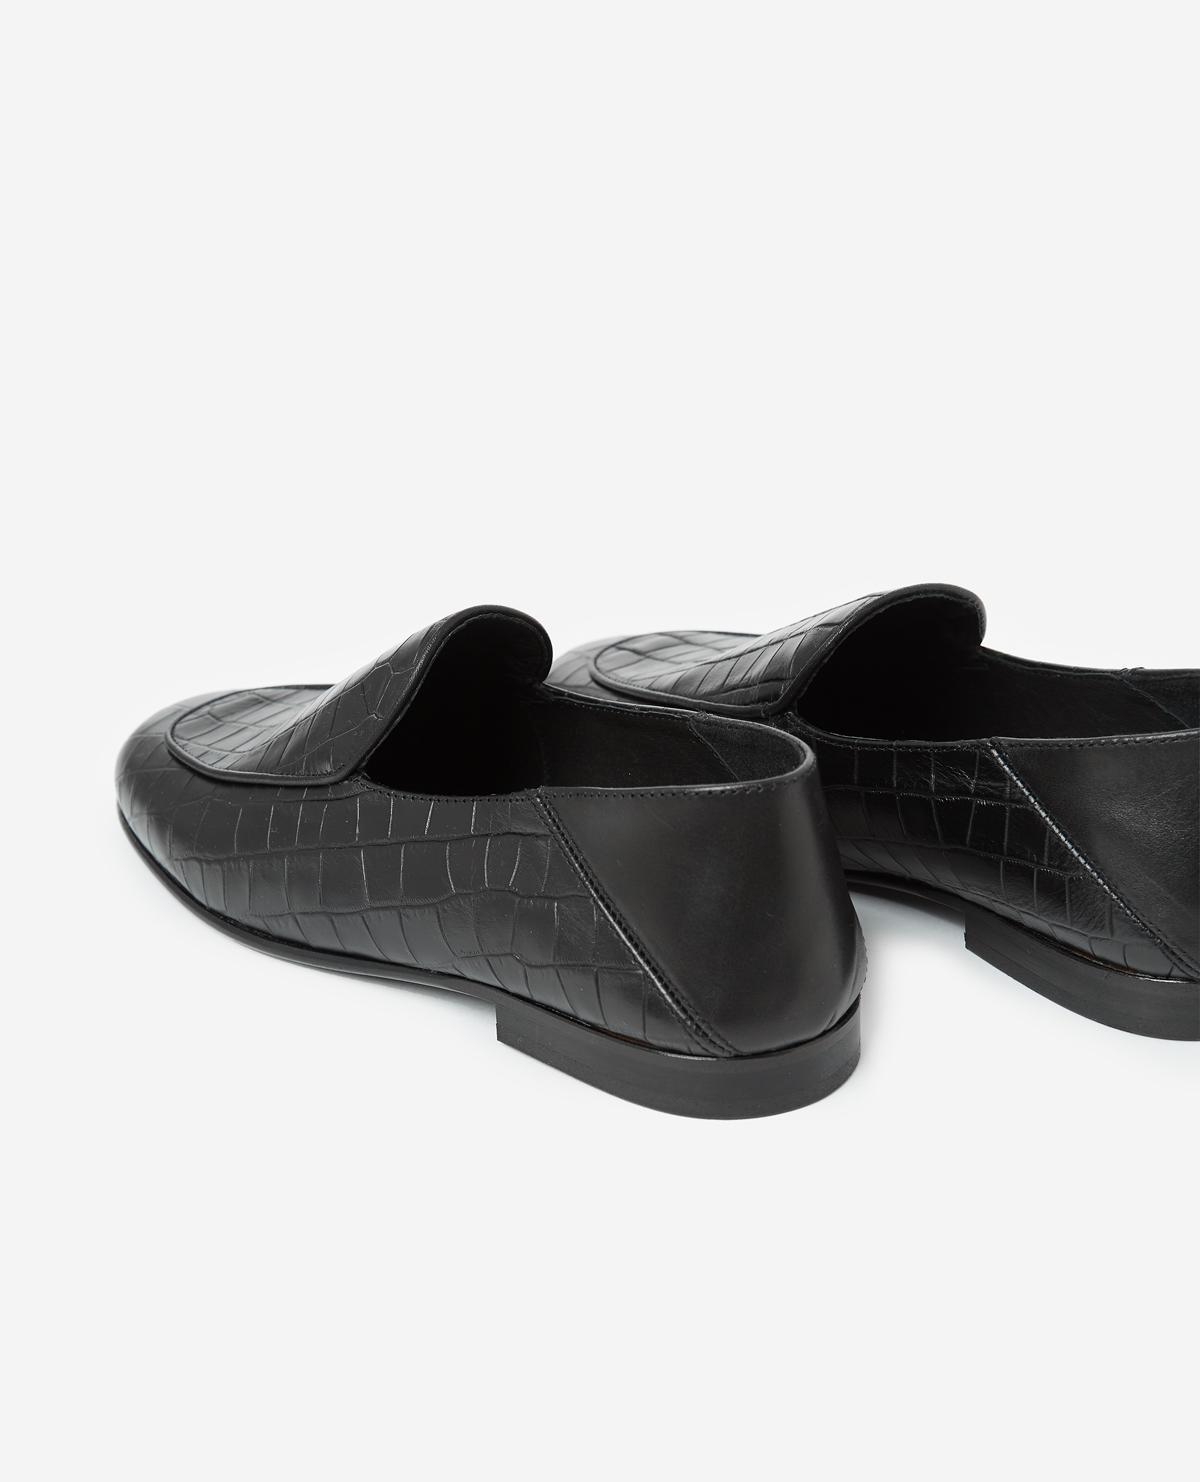 2c30725f76 The Kooples Black, Crocodile-effect Leather Slippers in Black - Lyst